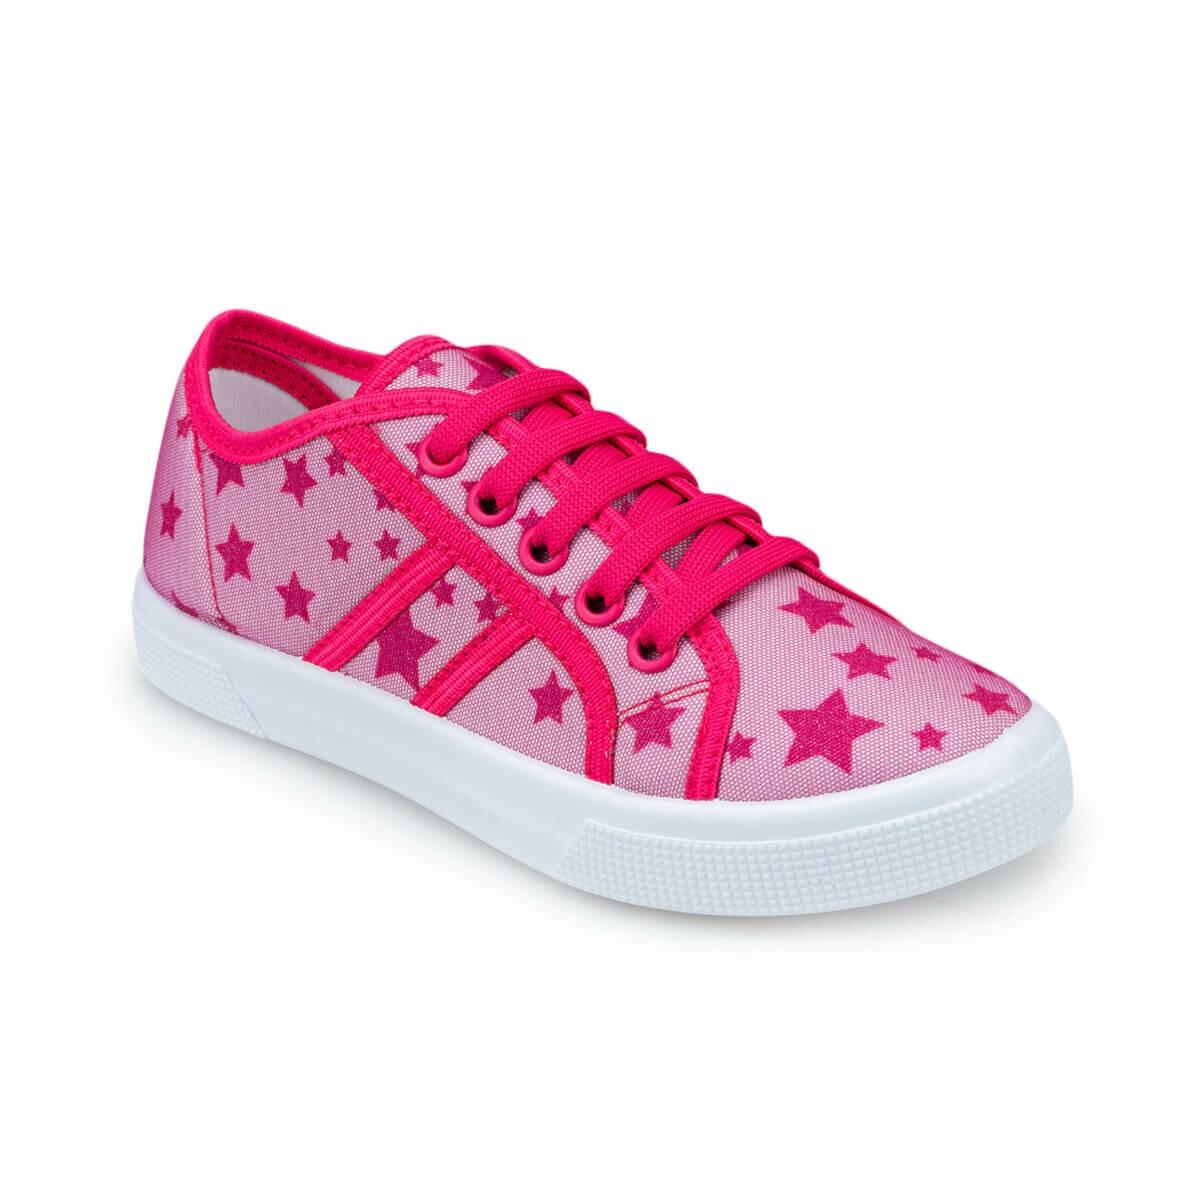 FLO 91.511246.F Fuchsia Girls Children Shoes Polaris